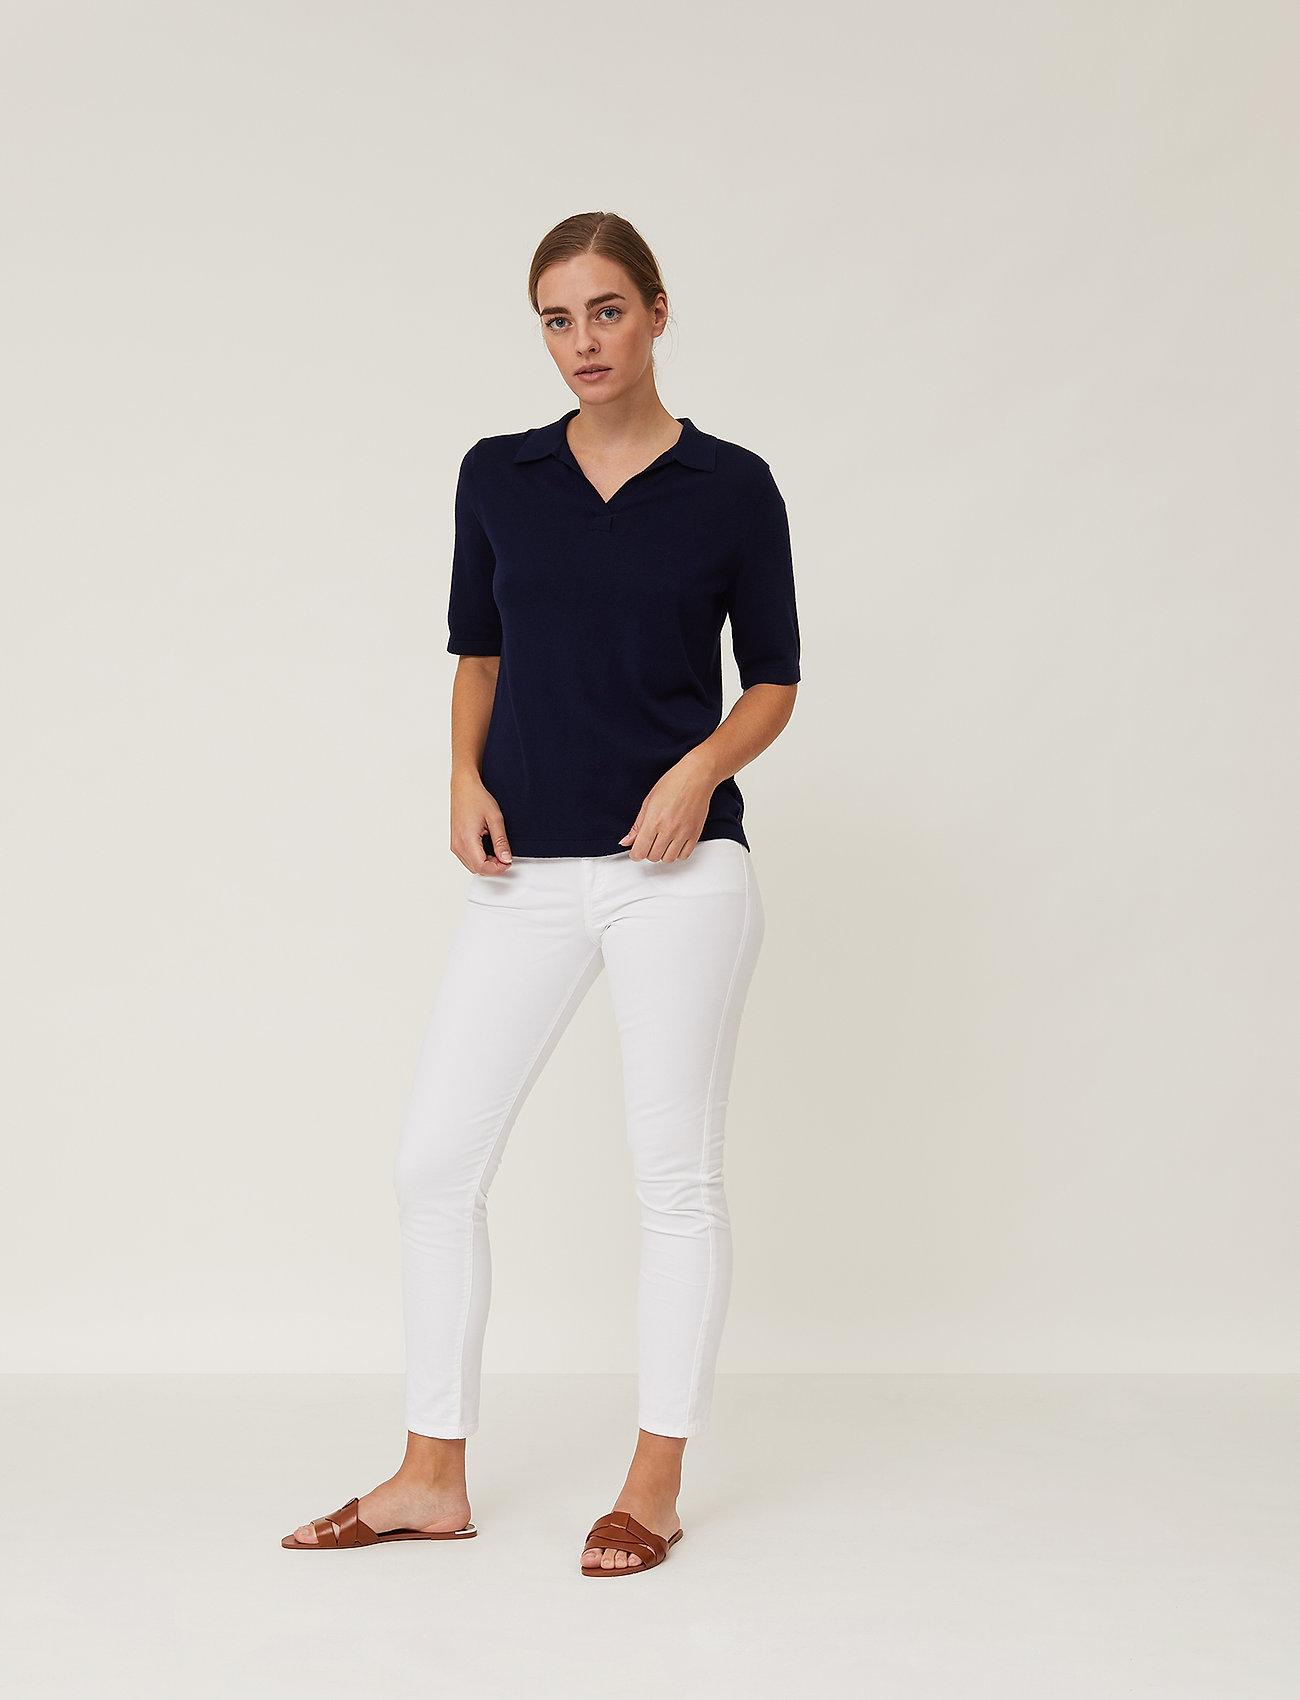 Lexington Clothing - Amilia Cotton/Silk Blend Short Sleeve Knitted Polo - polohemden - dark blue - 0